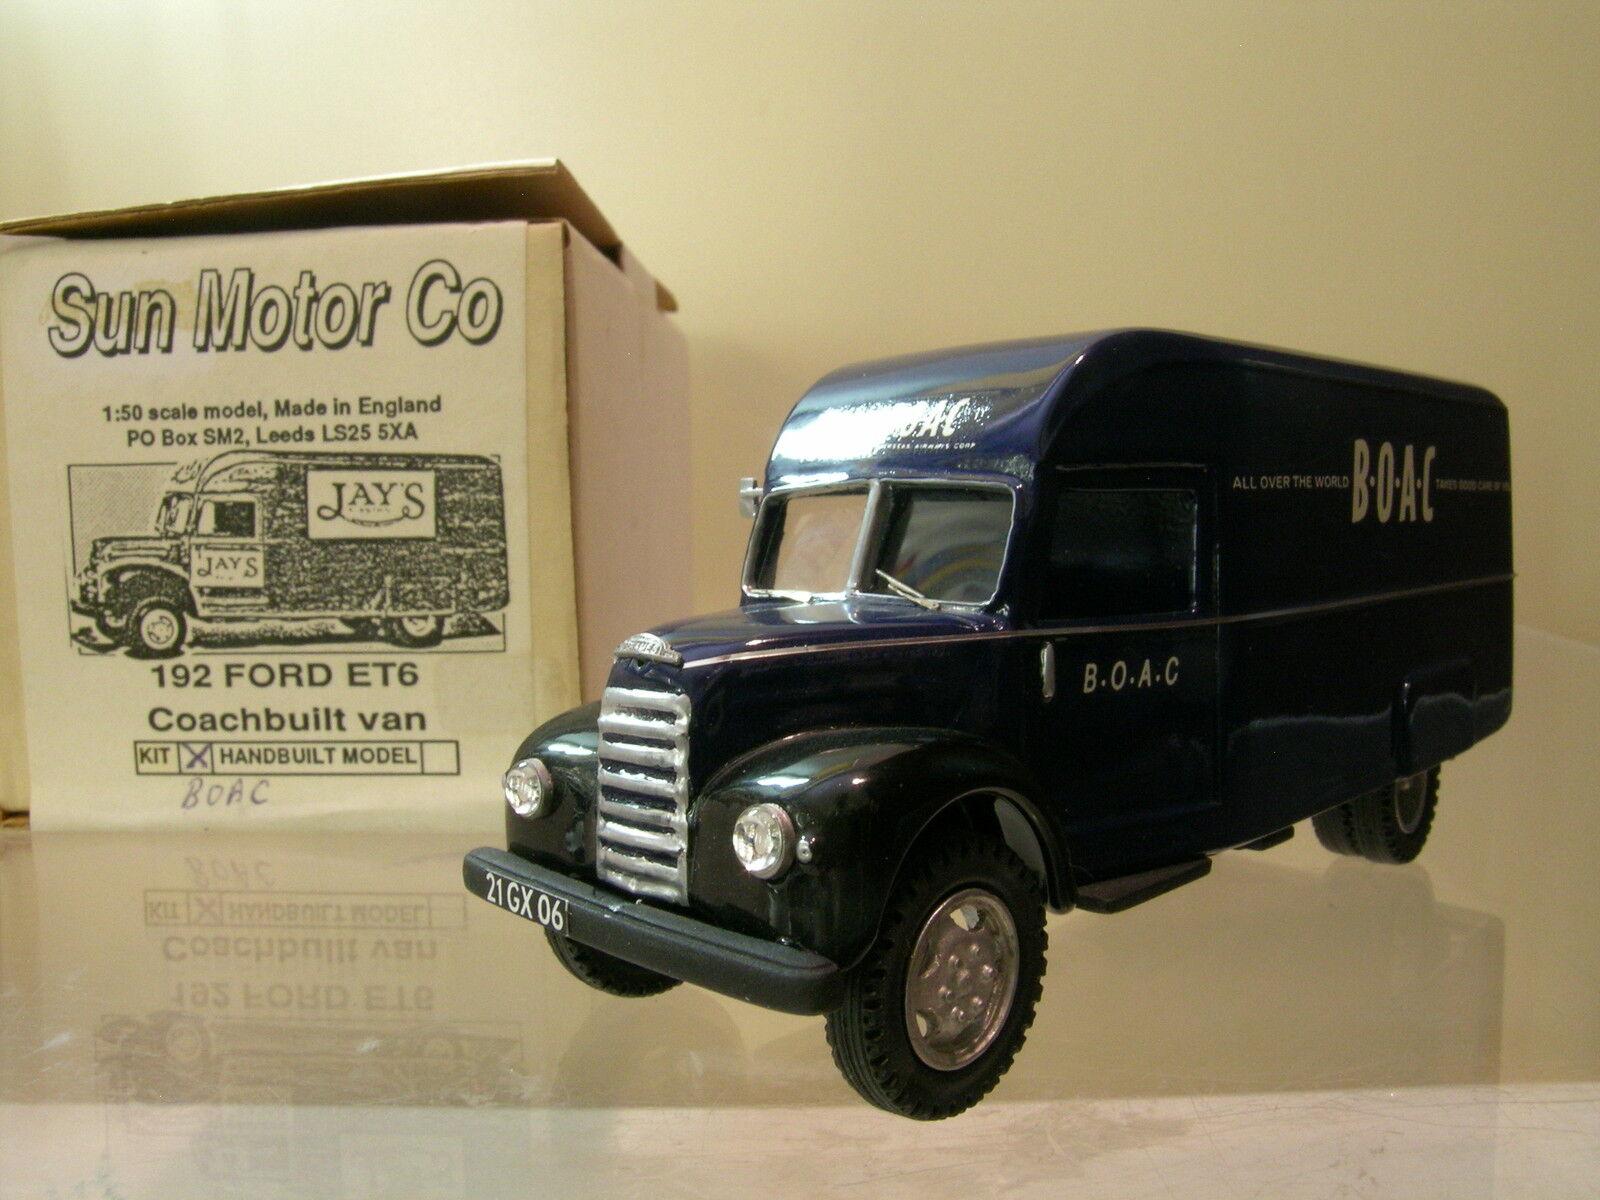 buscando agente de ventas SUN MOTOR CO NR.192 FORD FORD FORD THAMES ET6 VAN BOAC 1957 azul HANDBUILT SCALE 1 50  tienda de ventas outlet